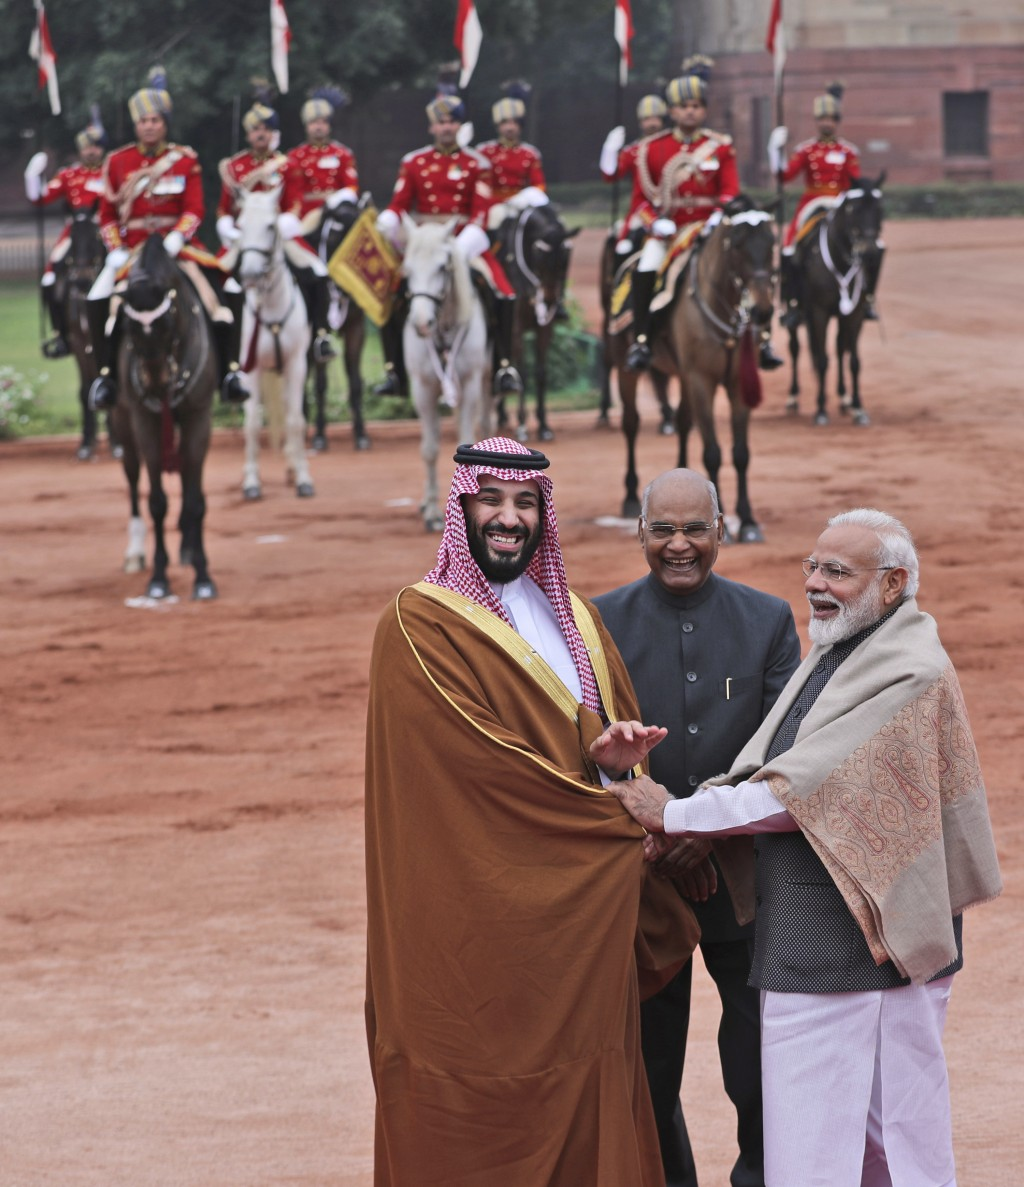 Saudi Arabia's Crown Prince Mohammed bin Salman shakes hand with Indian Prime Minister Narendra Modi, with Indian President Ram Nath Kovind standing b